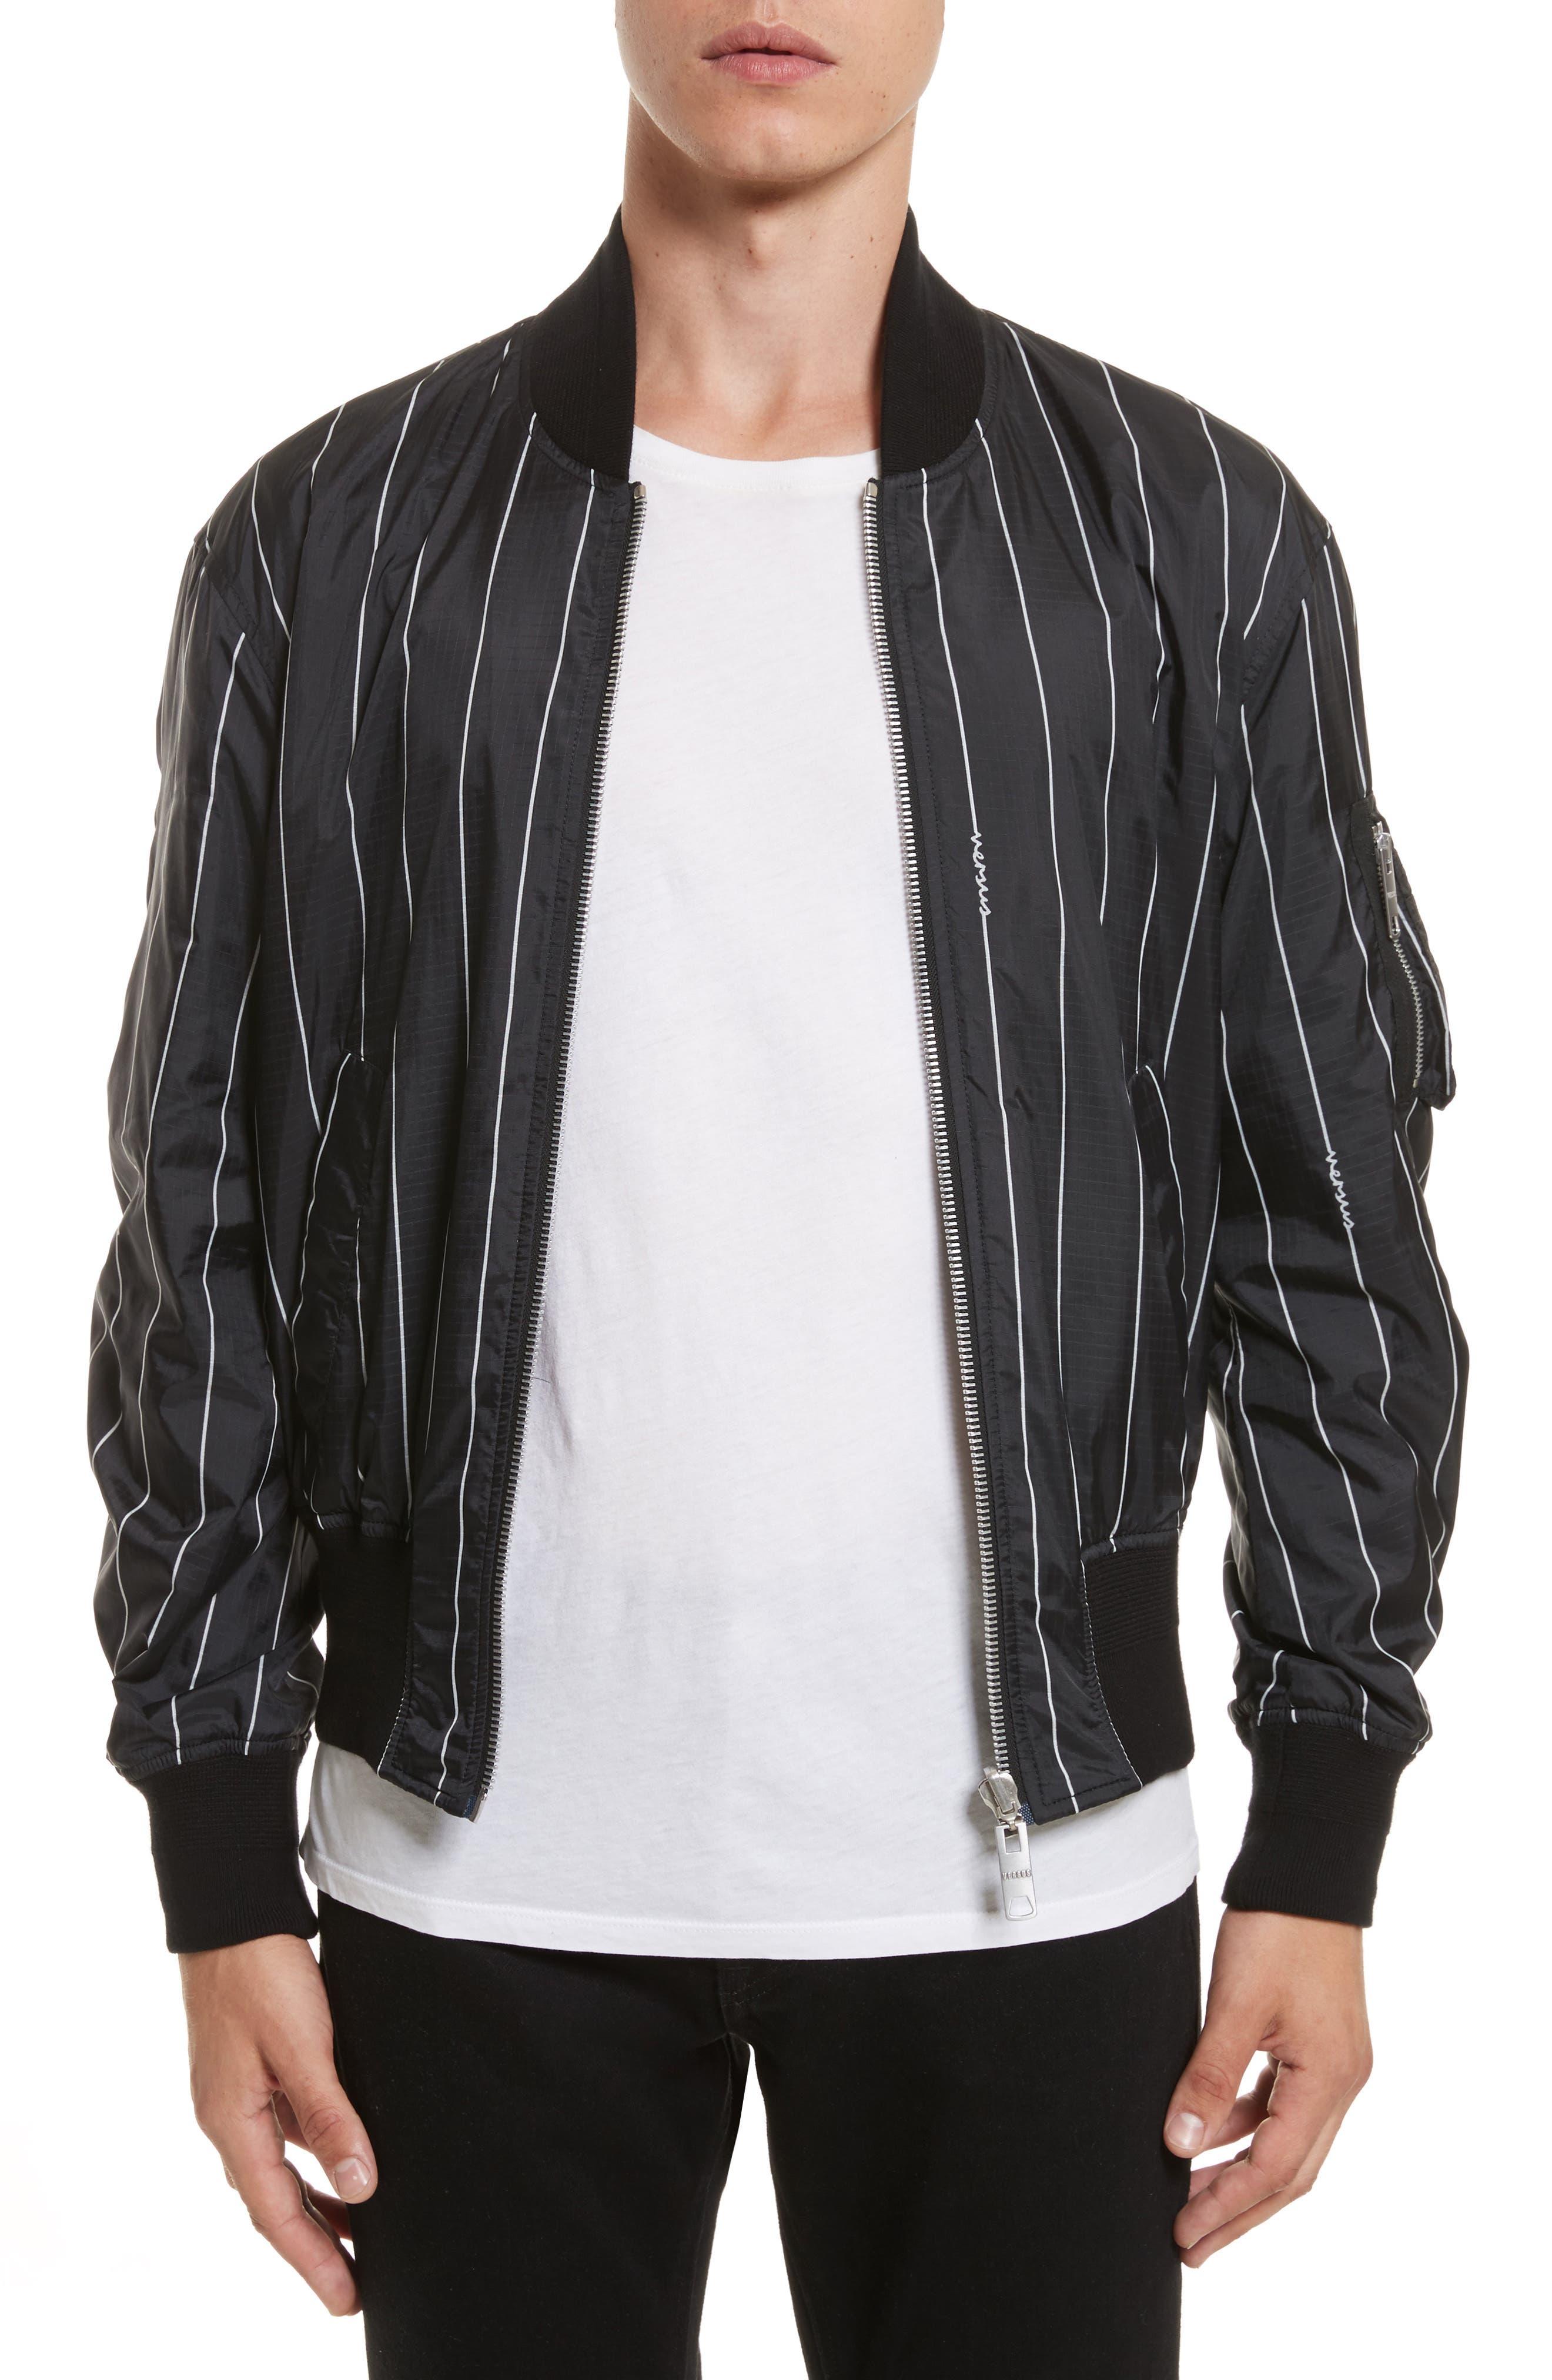 VERSUS by Versace Reversible Pinstripe Bomber Jacket,                         Main,                         color, Black